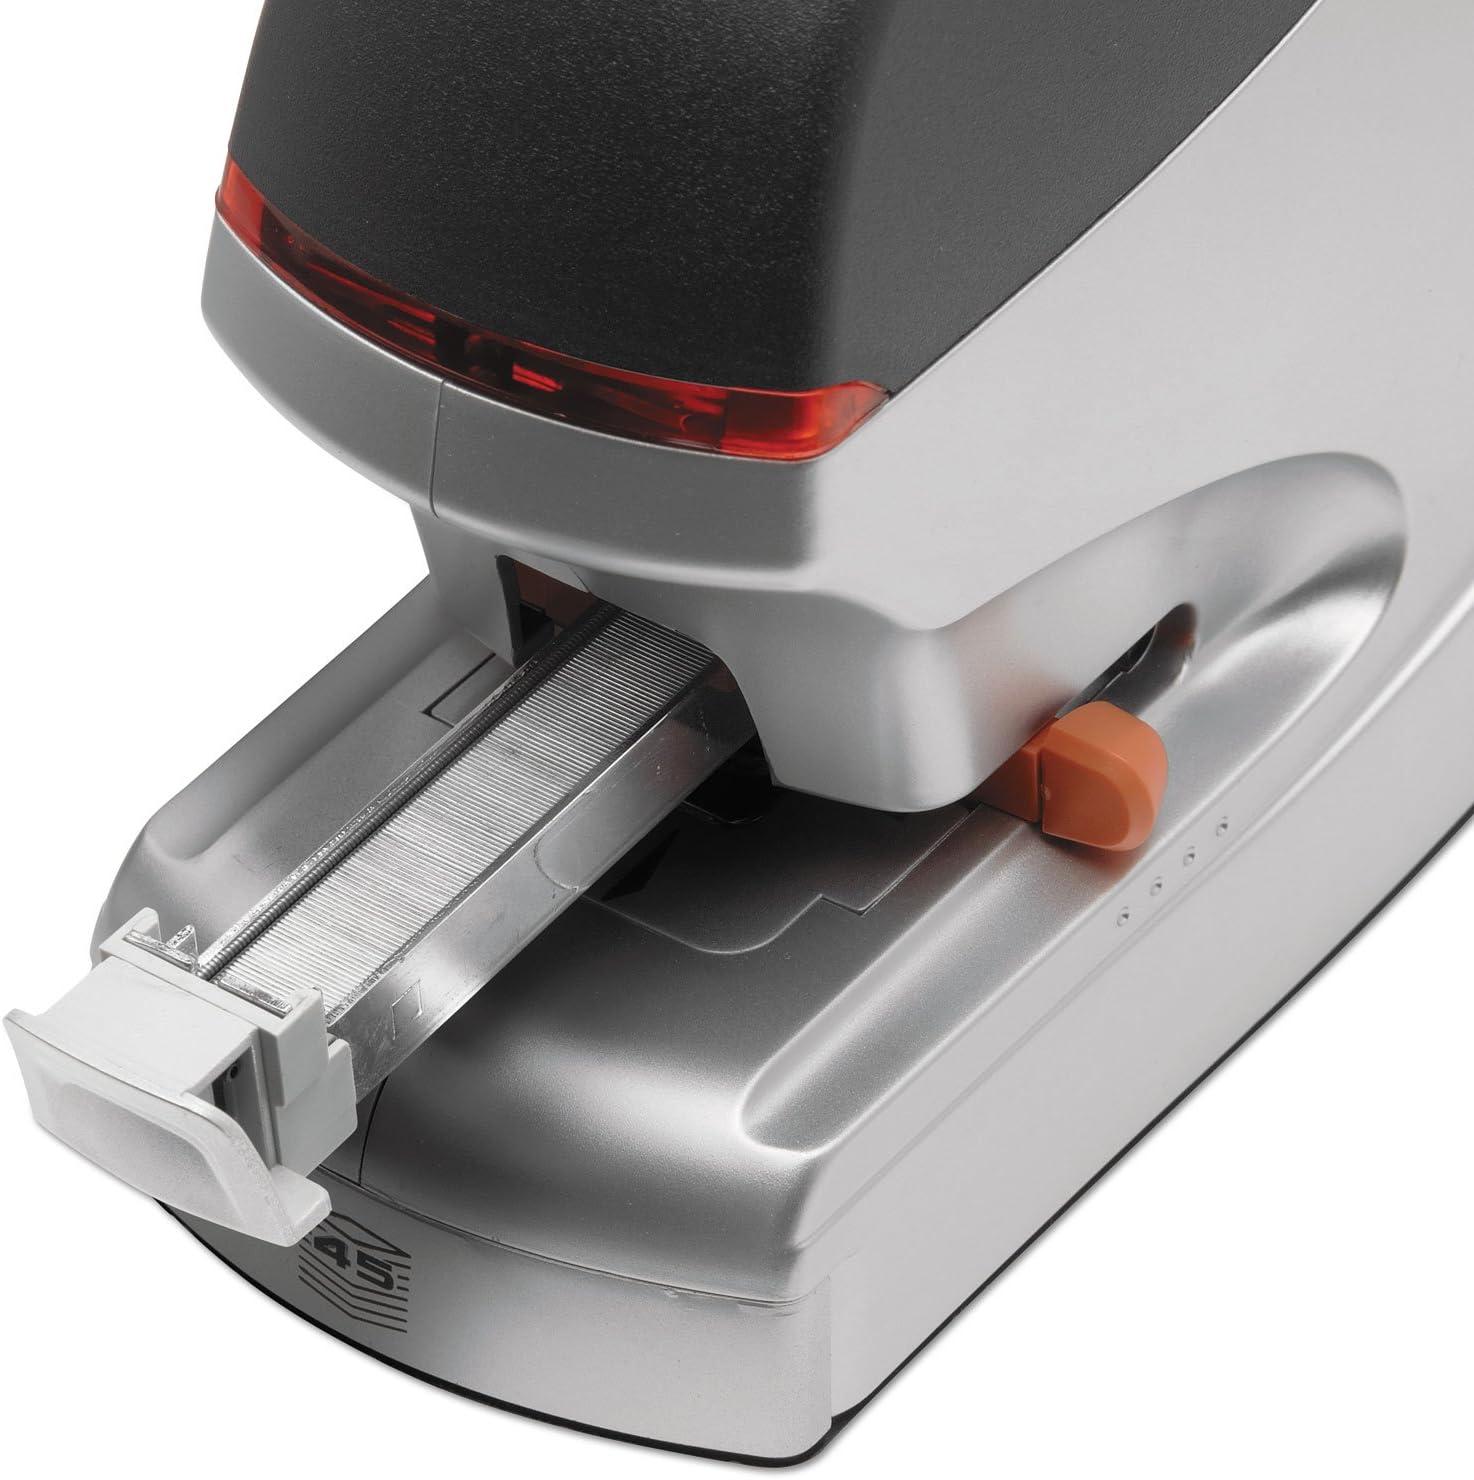 Swingline 48209 Optima 45 Electric Stapler Value Pack, 45 Sheet Cap, Silver : Heavy Duty Desk Staplers : Office Products